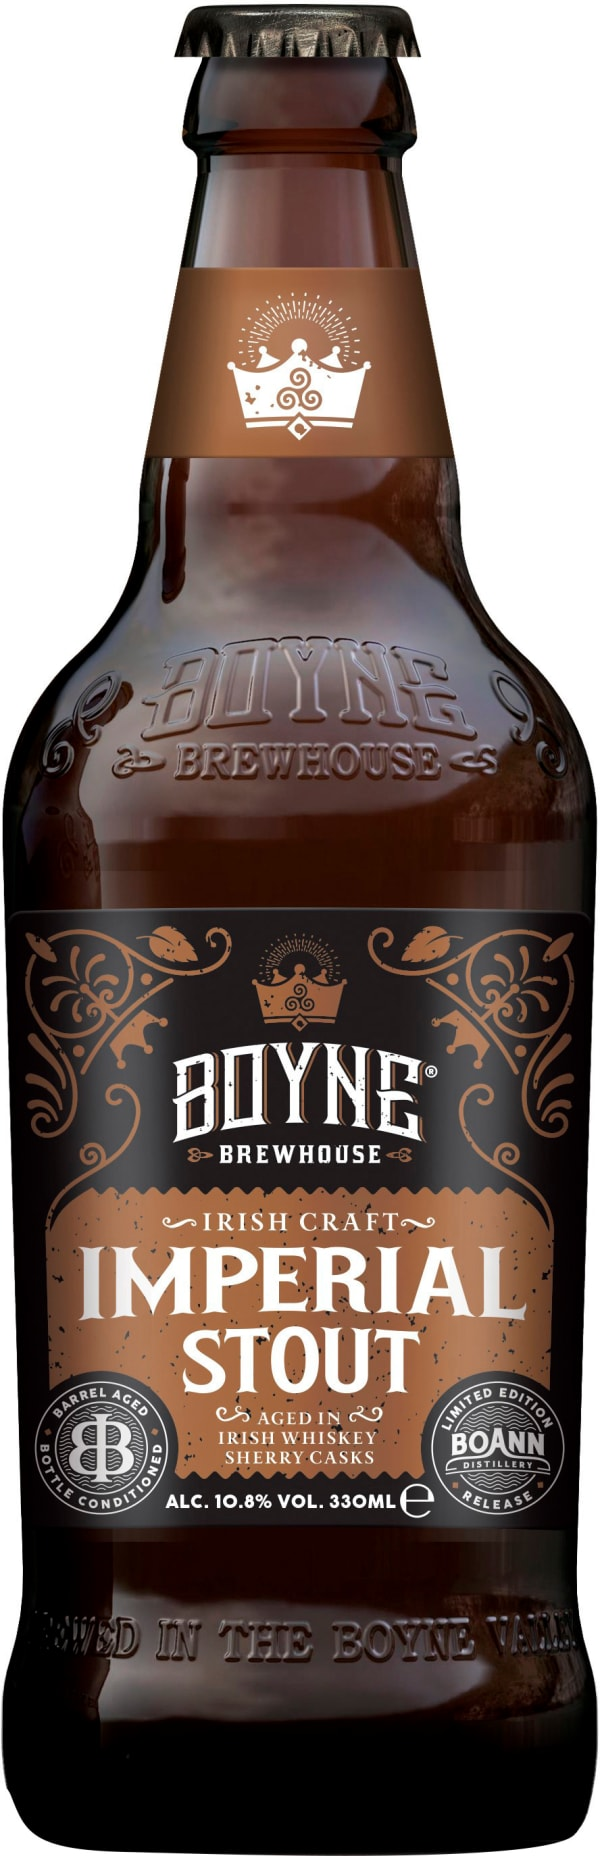 Boyne Sherry Cask Imperial Stout